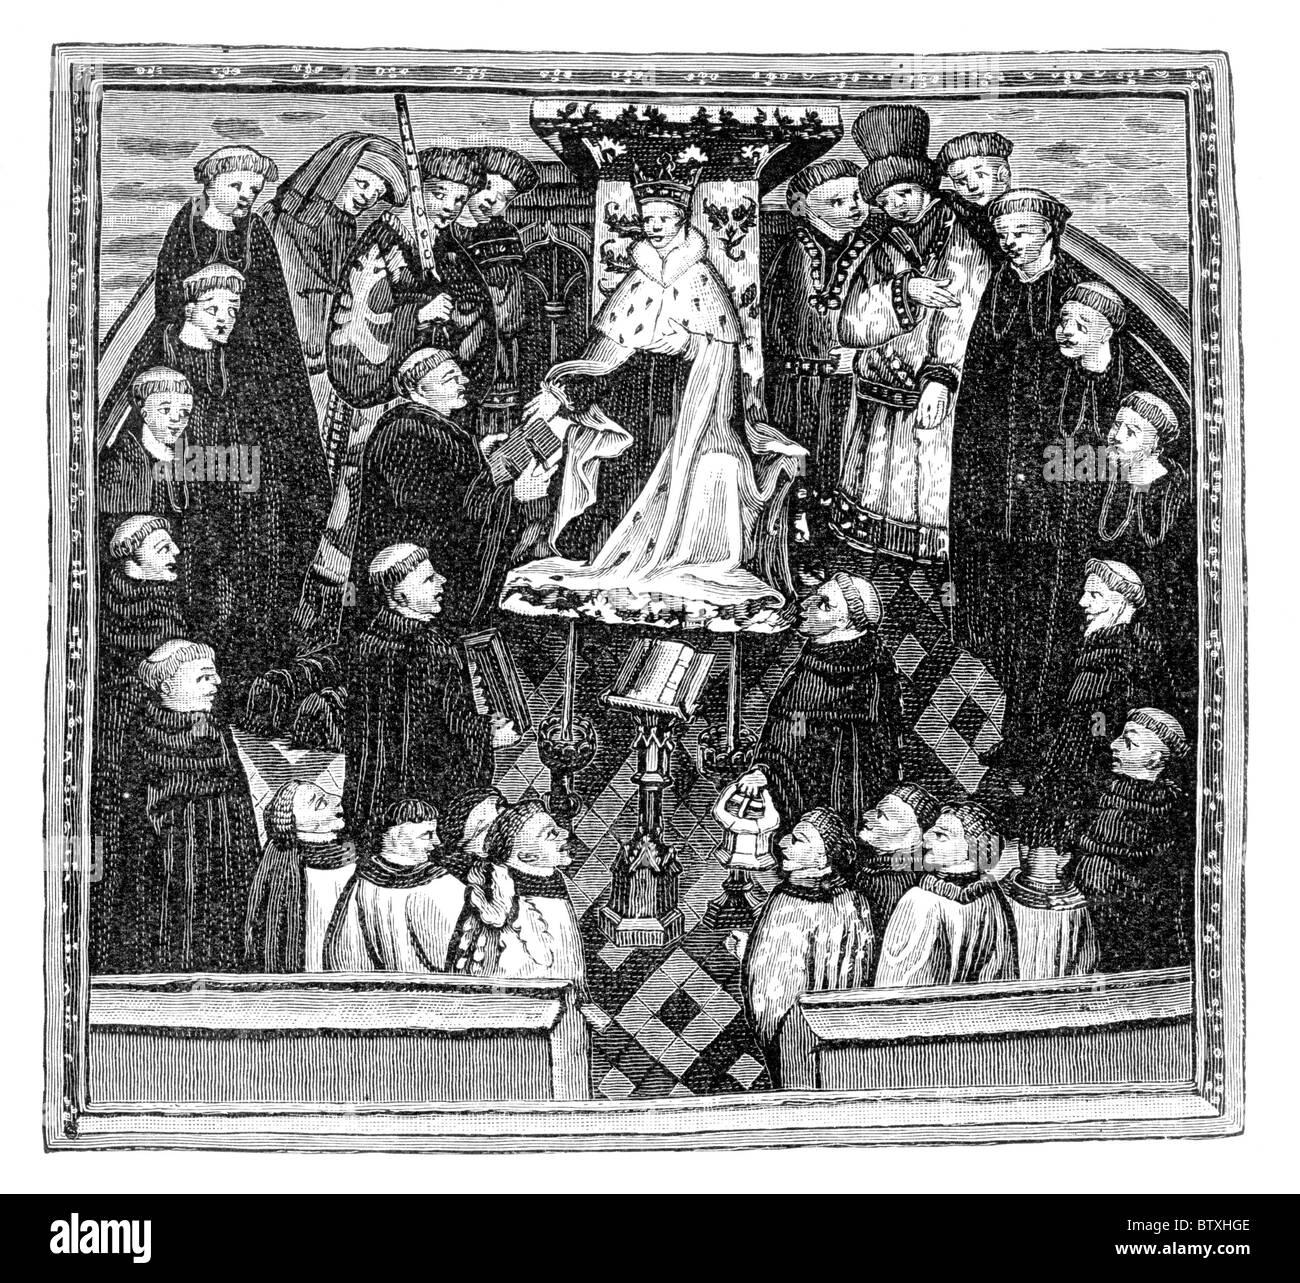 John Lydgate presenting his book 'The Lives of Saints Edmund and Fremund' to King Henry VI; Bury St Edmunds, - Stock Image